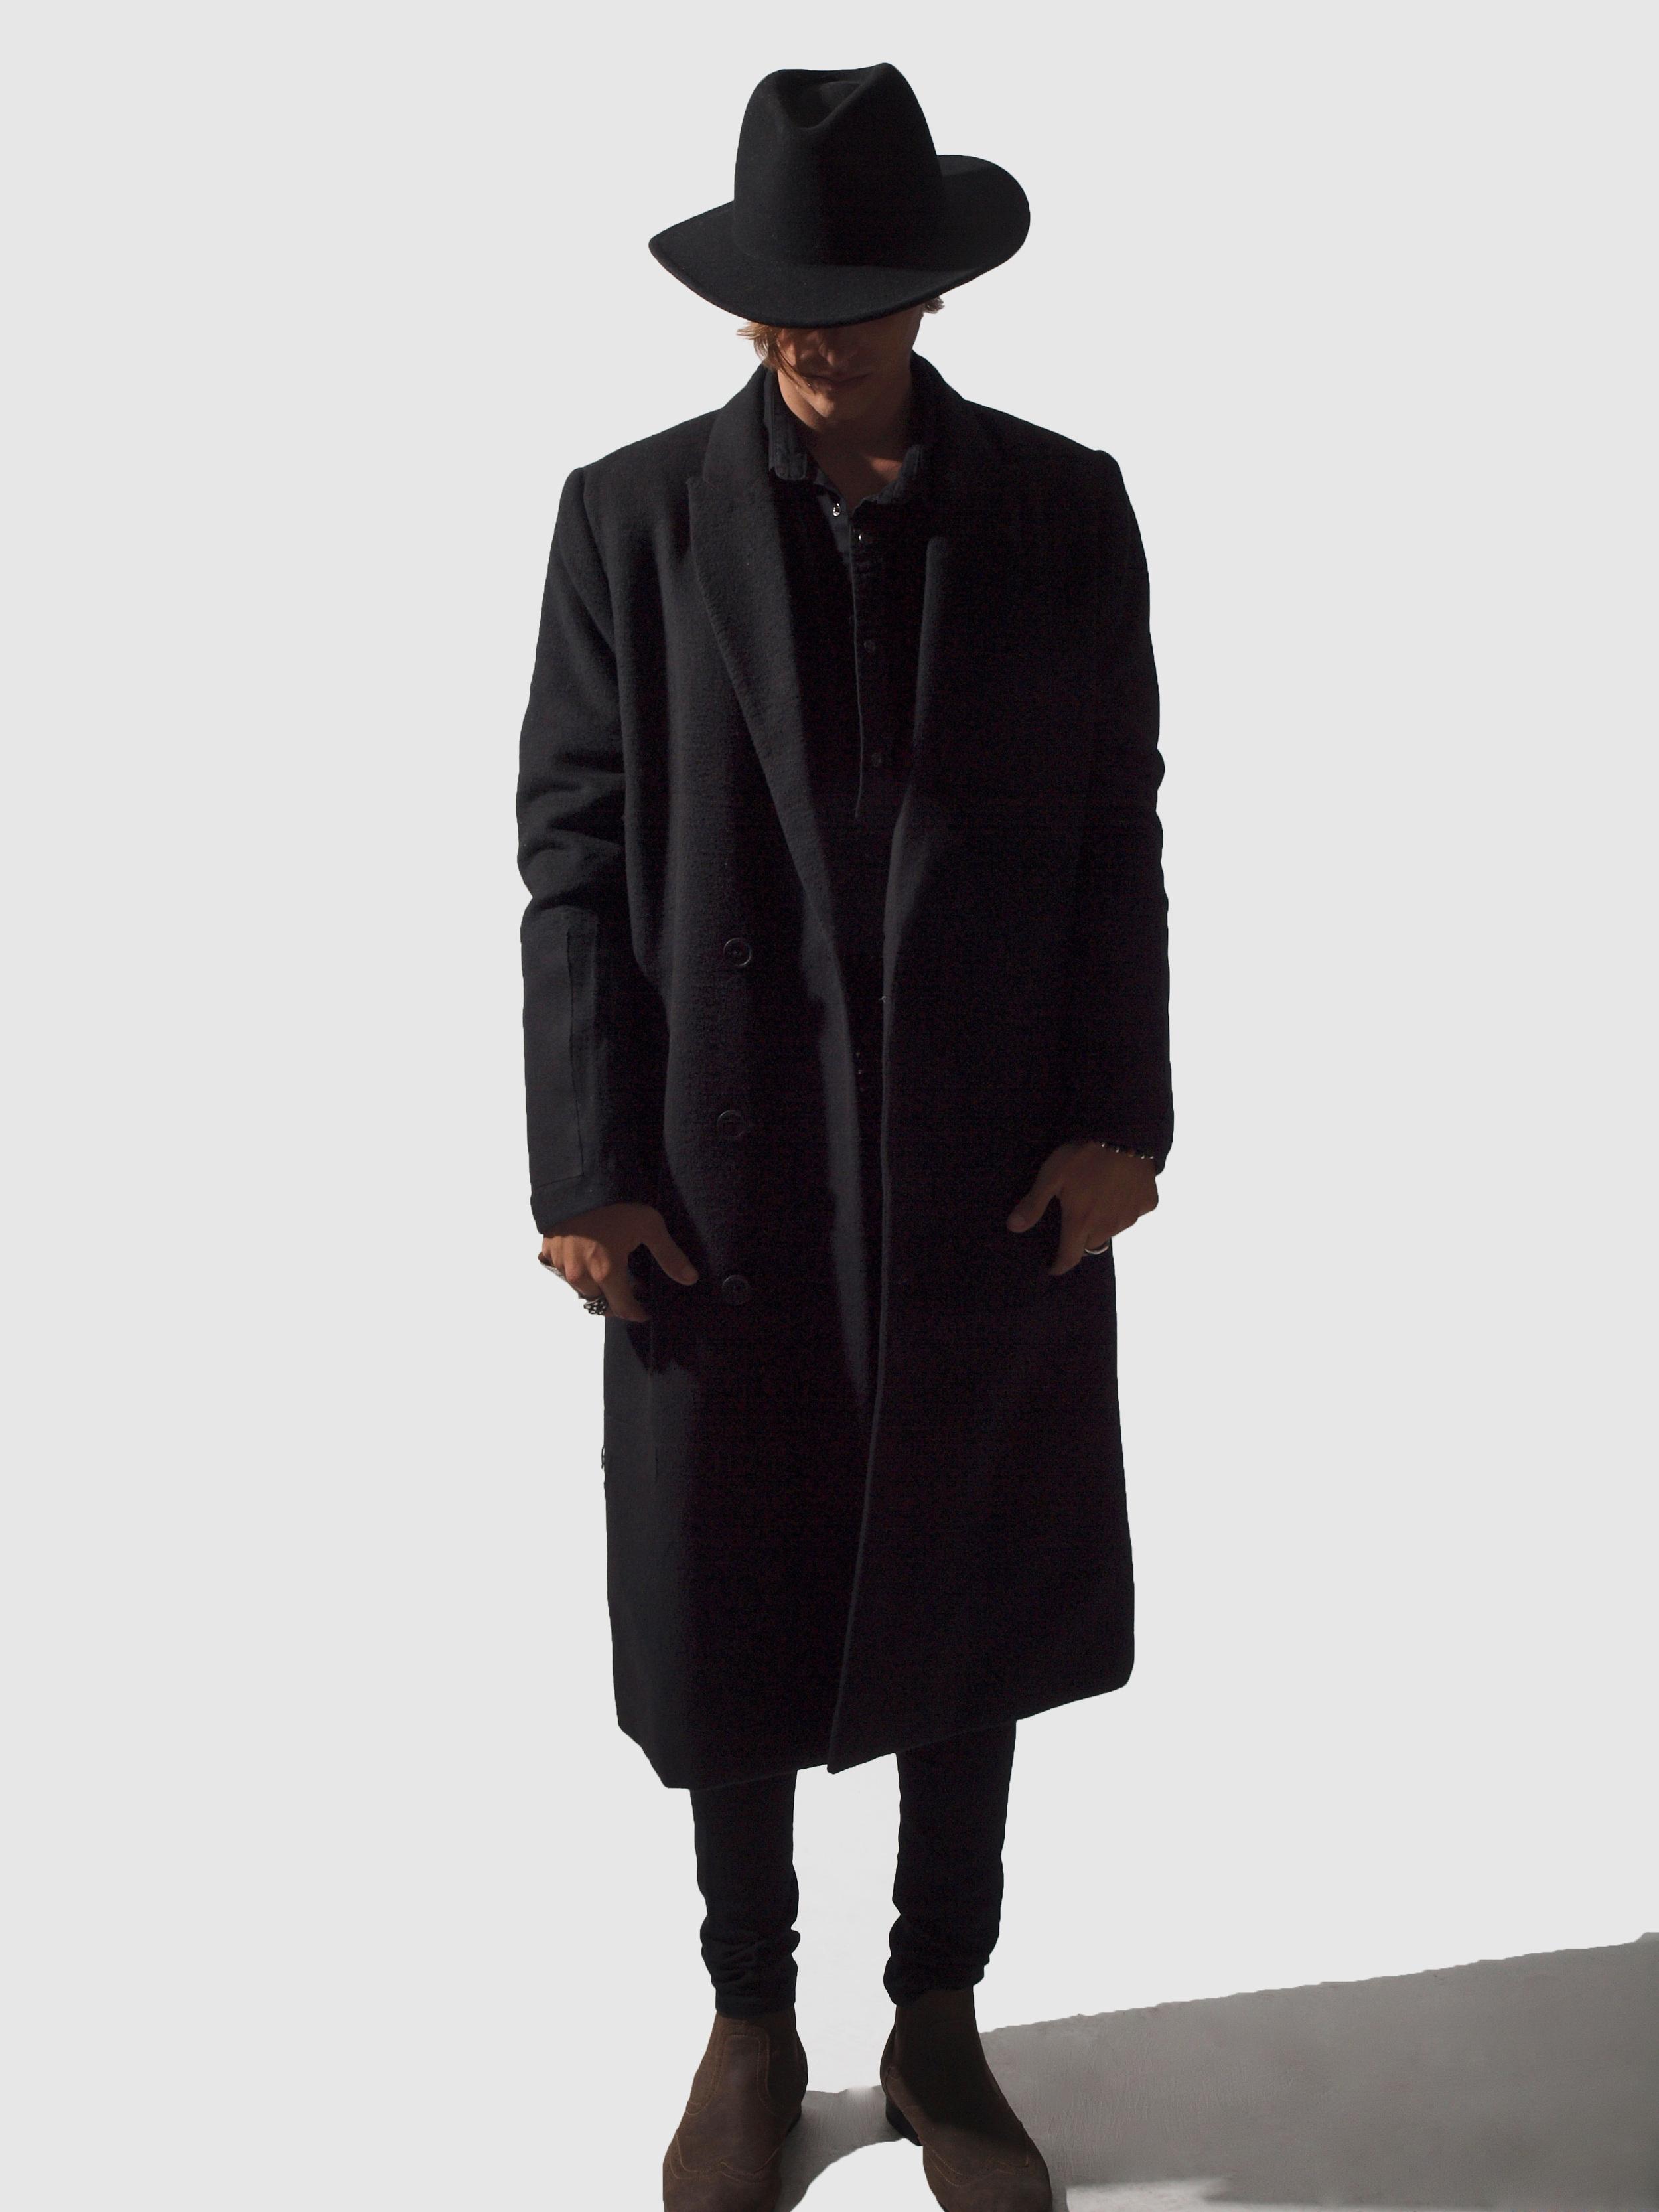 ERIS BLACK - DARK COAT